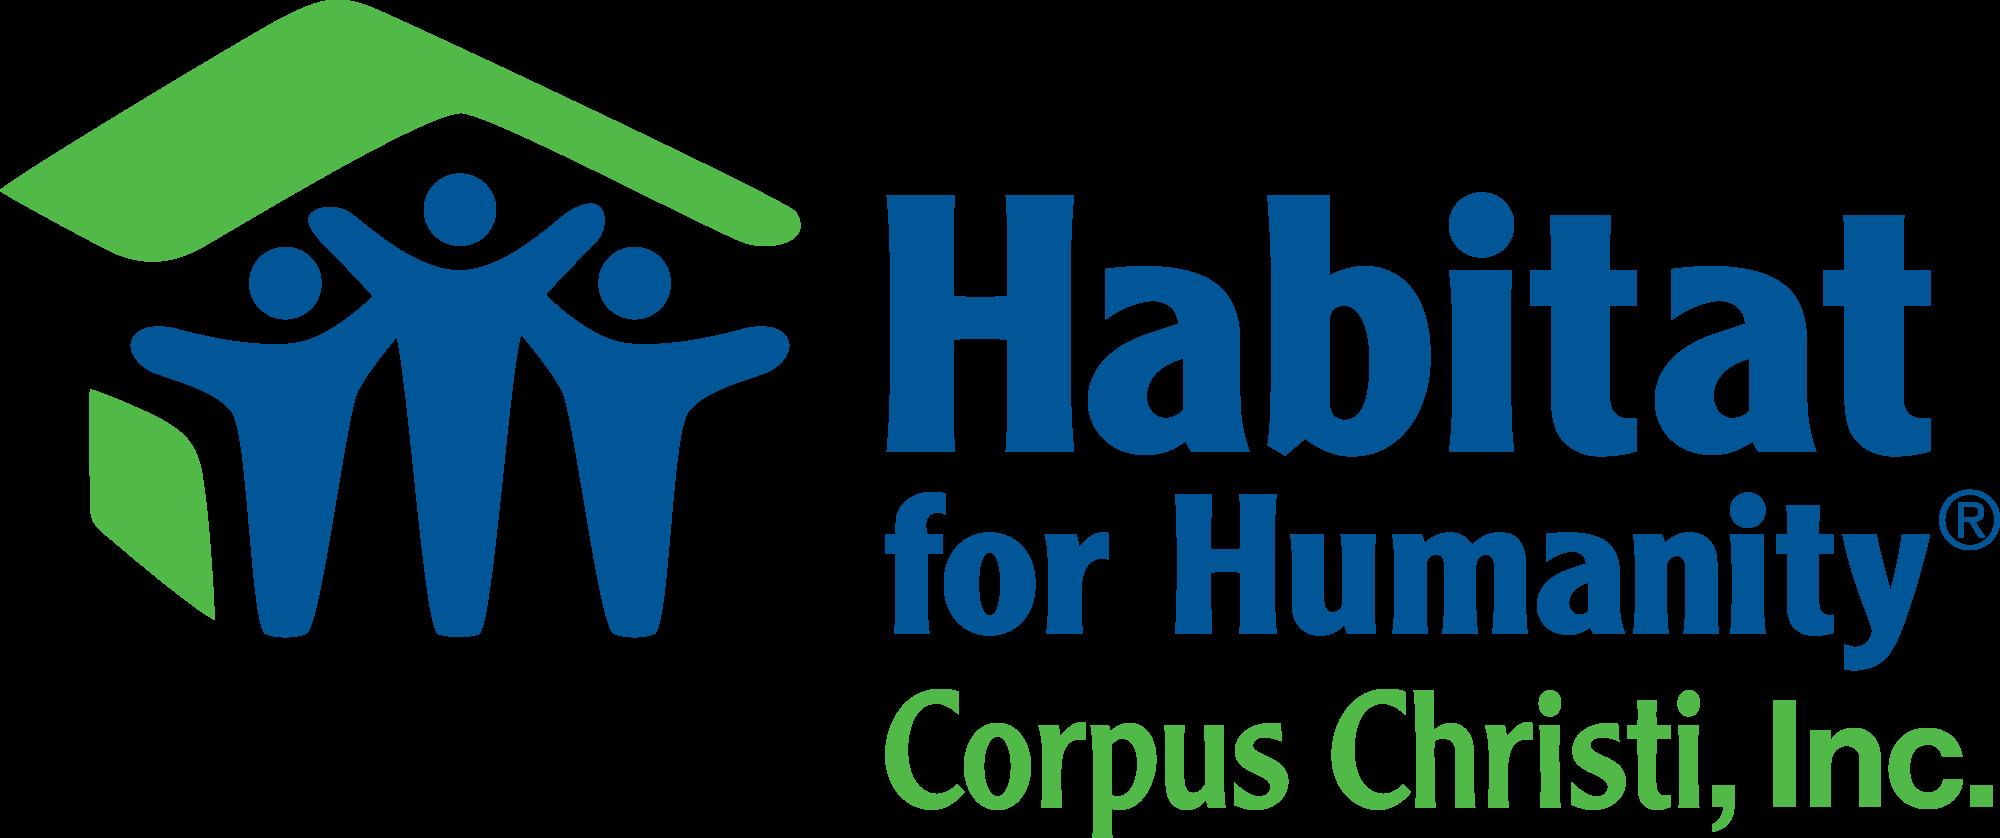 Habitat for Humanity Corpus Christi, Inc.